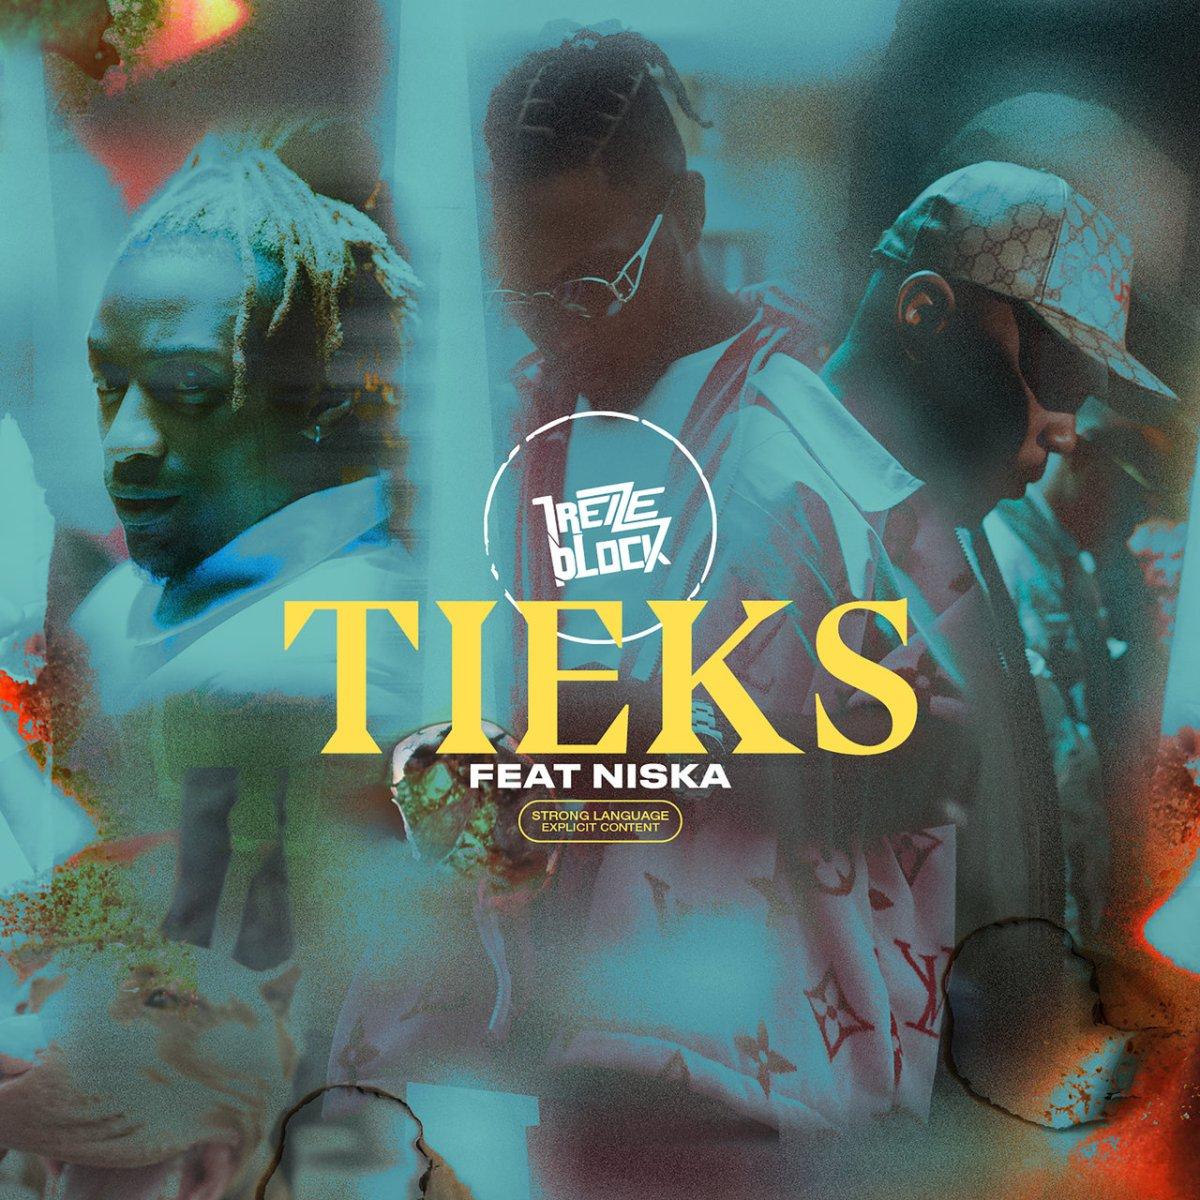 13 Block - Tieks (ft. Niska) (Cover)